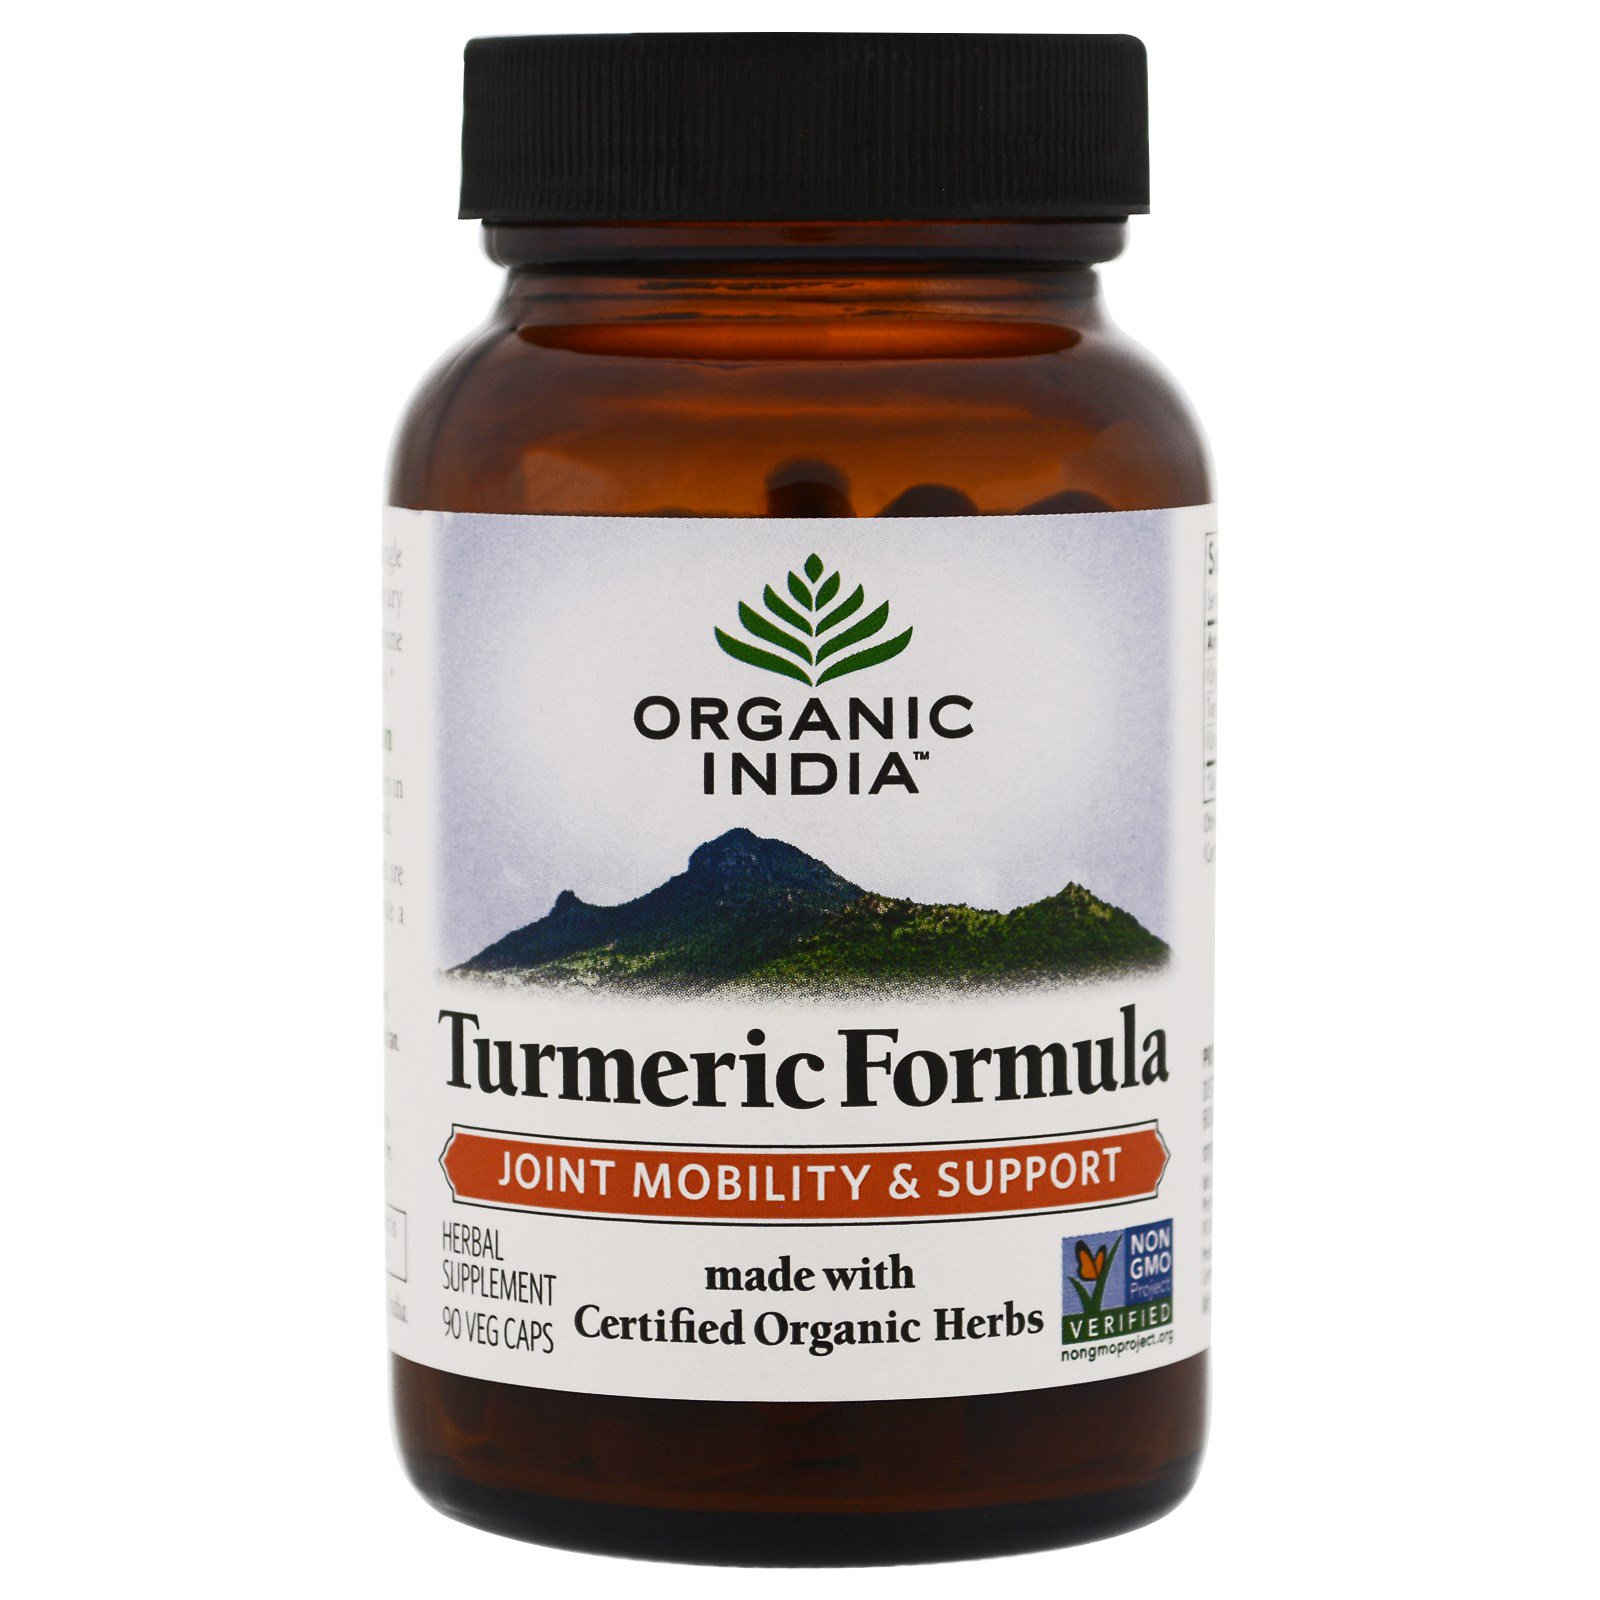 Organic india curcumin